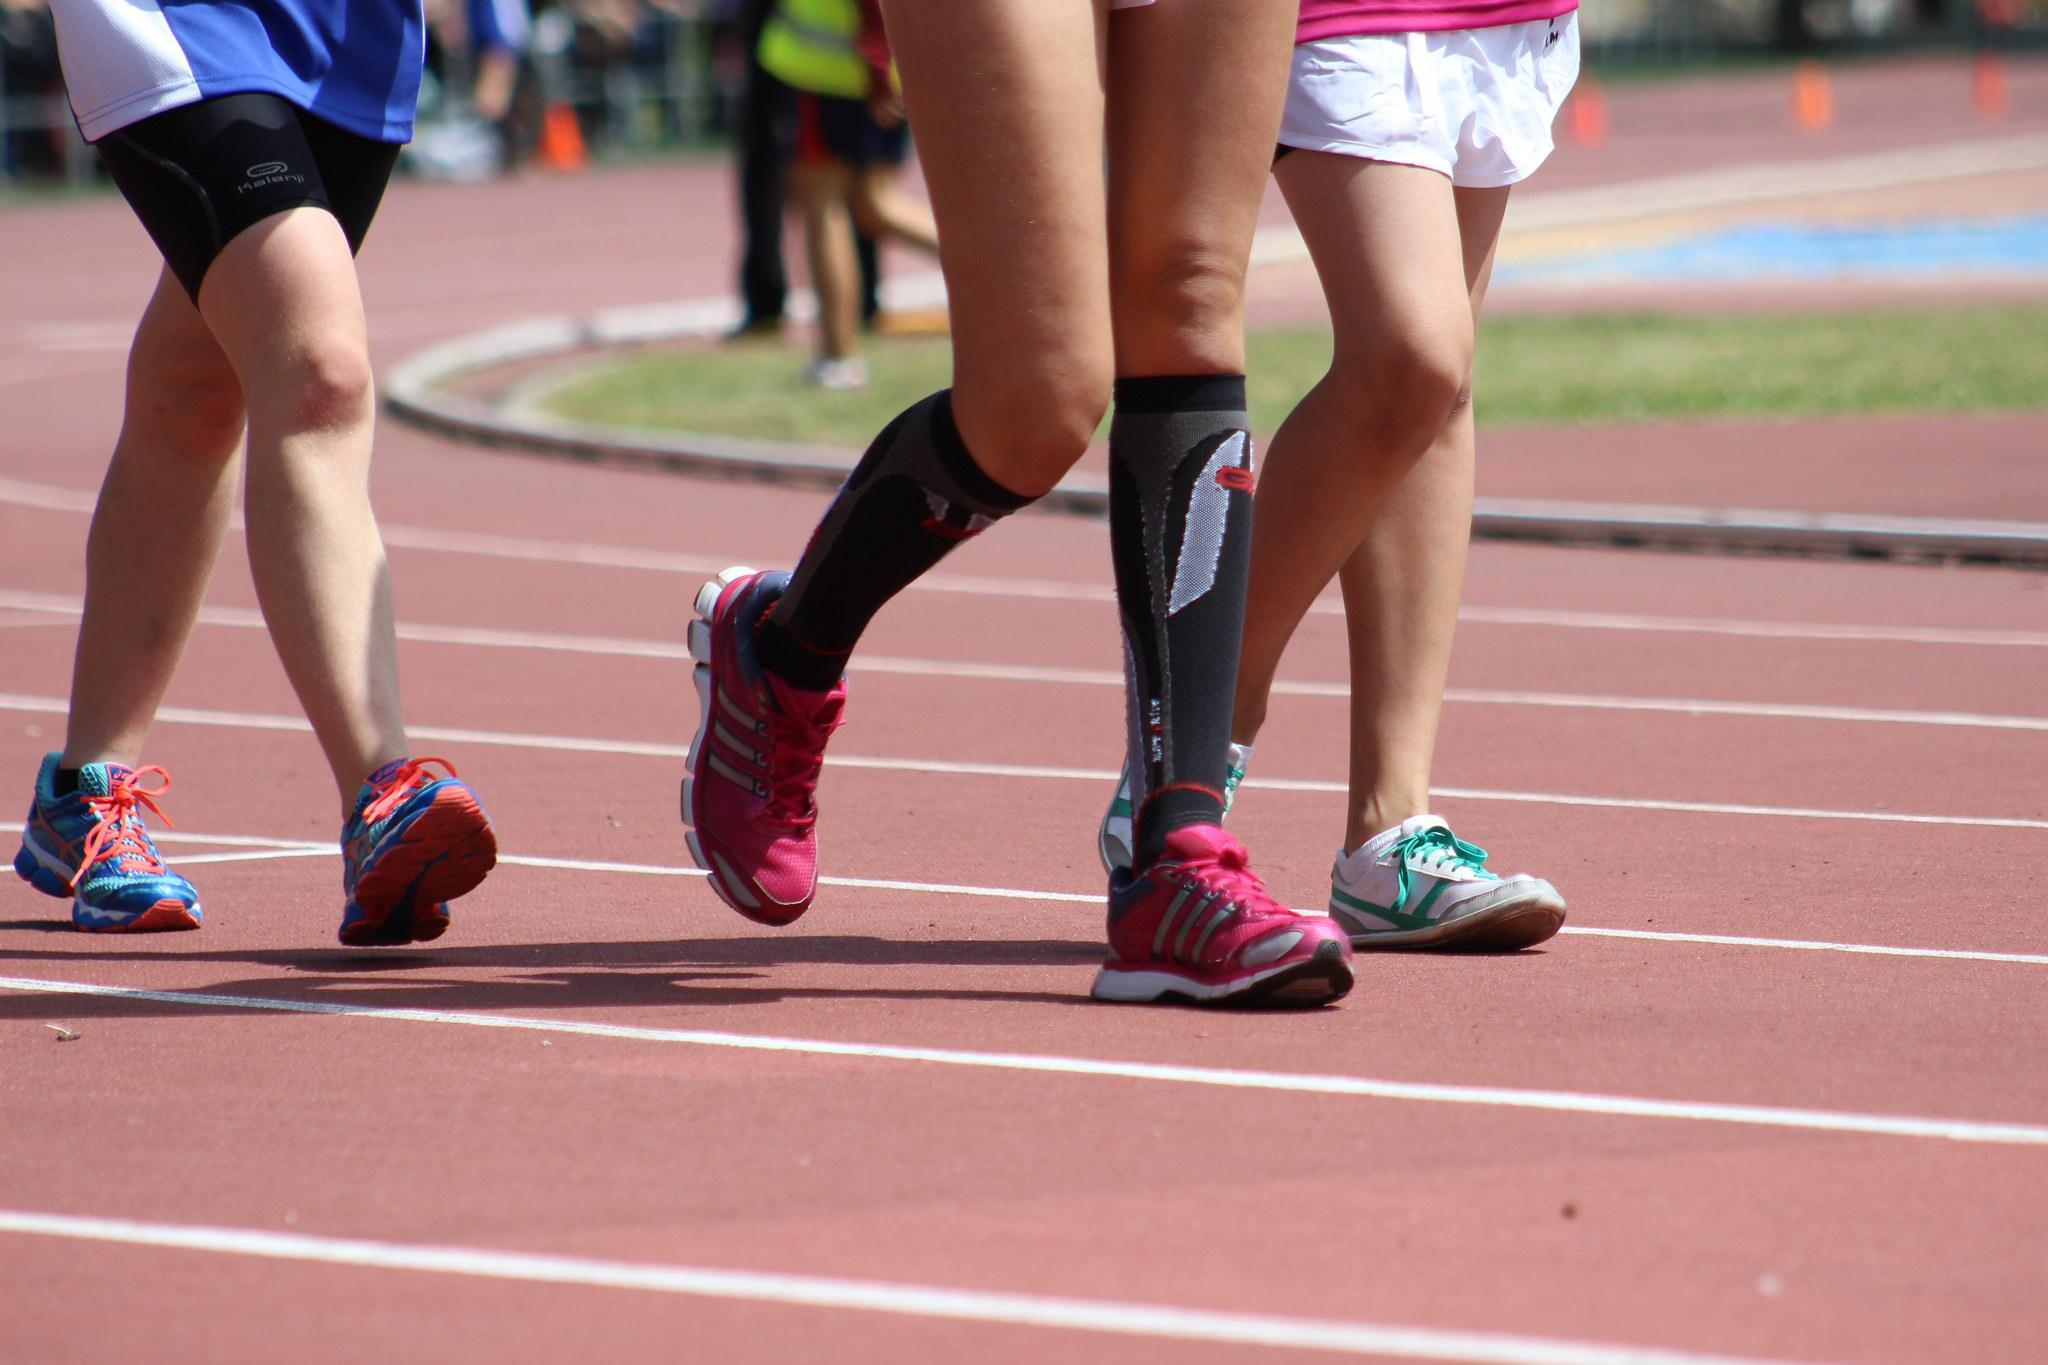 atletismoa_2014.jpg